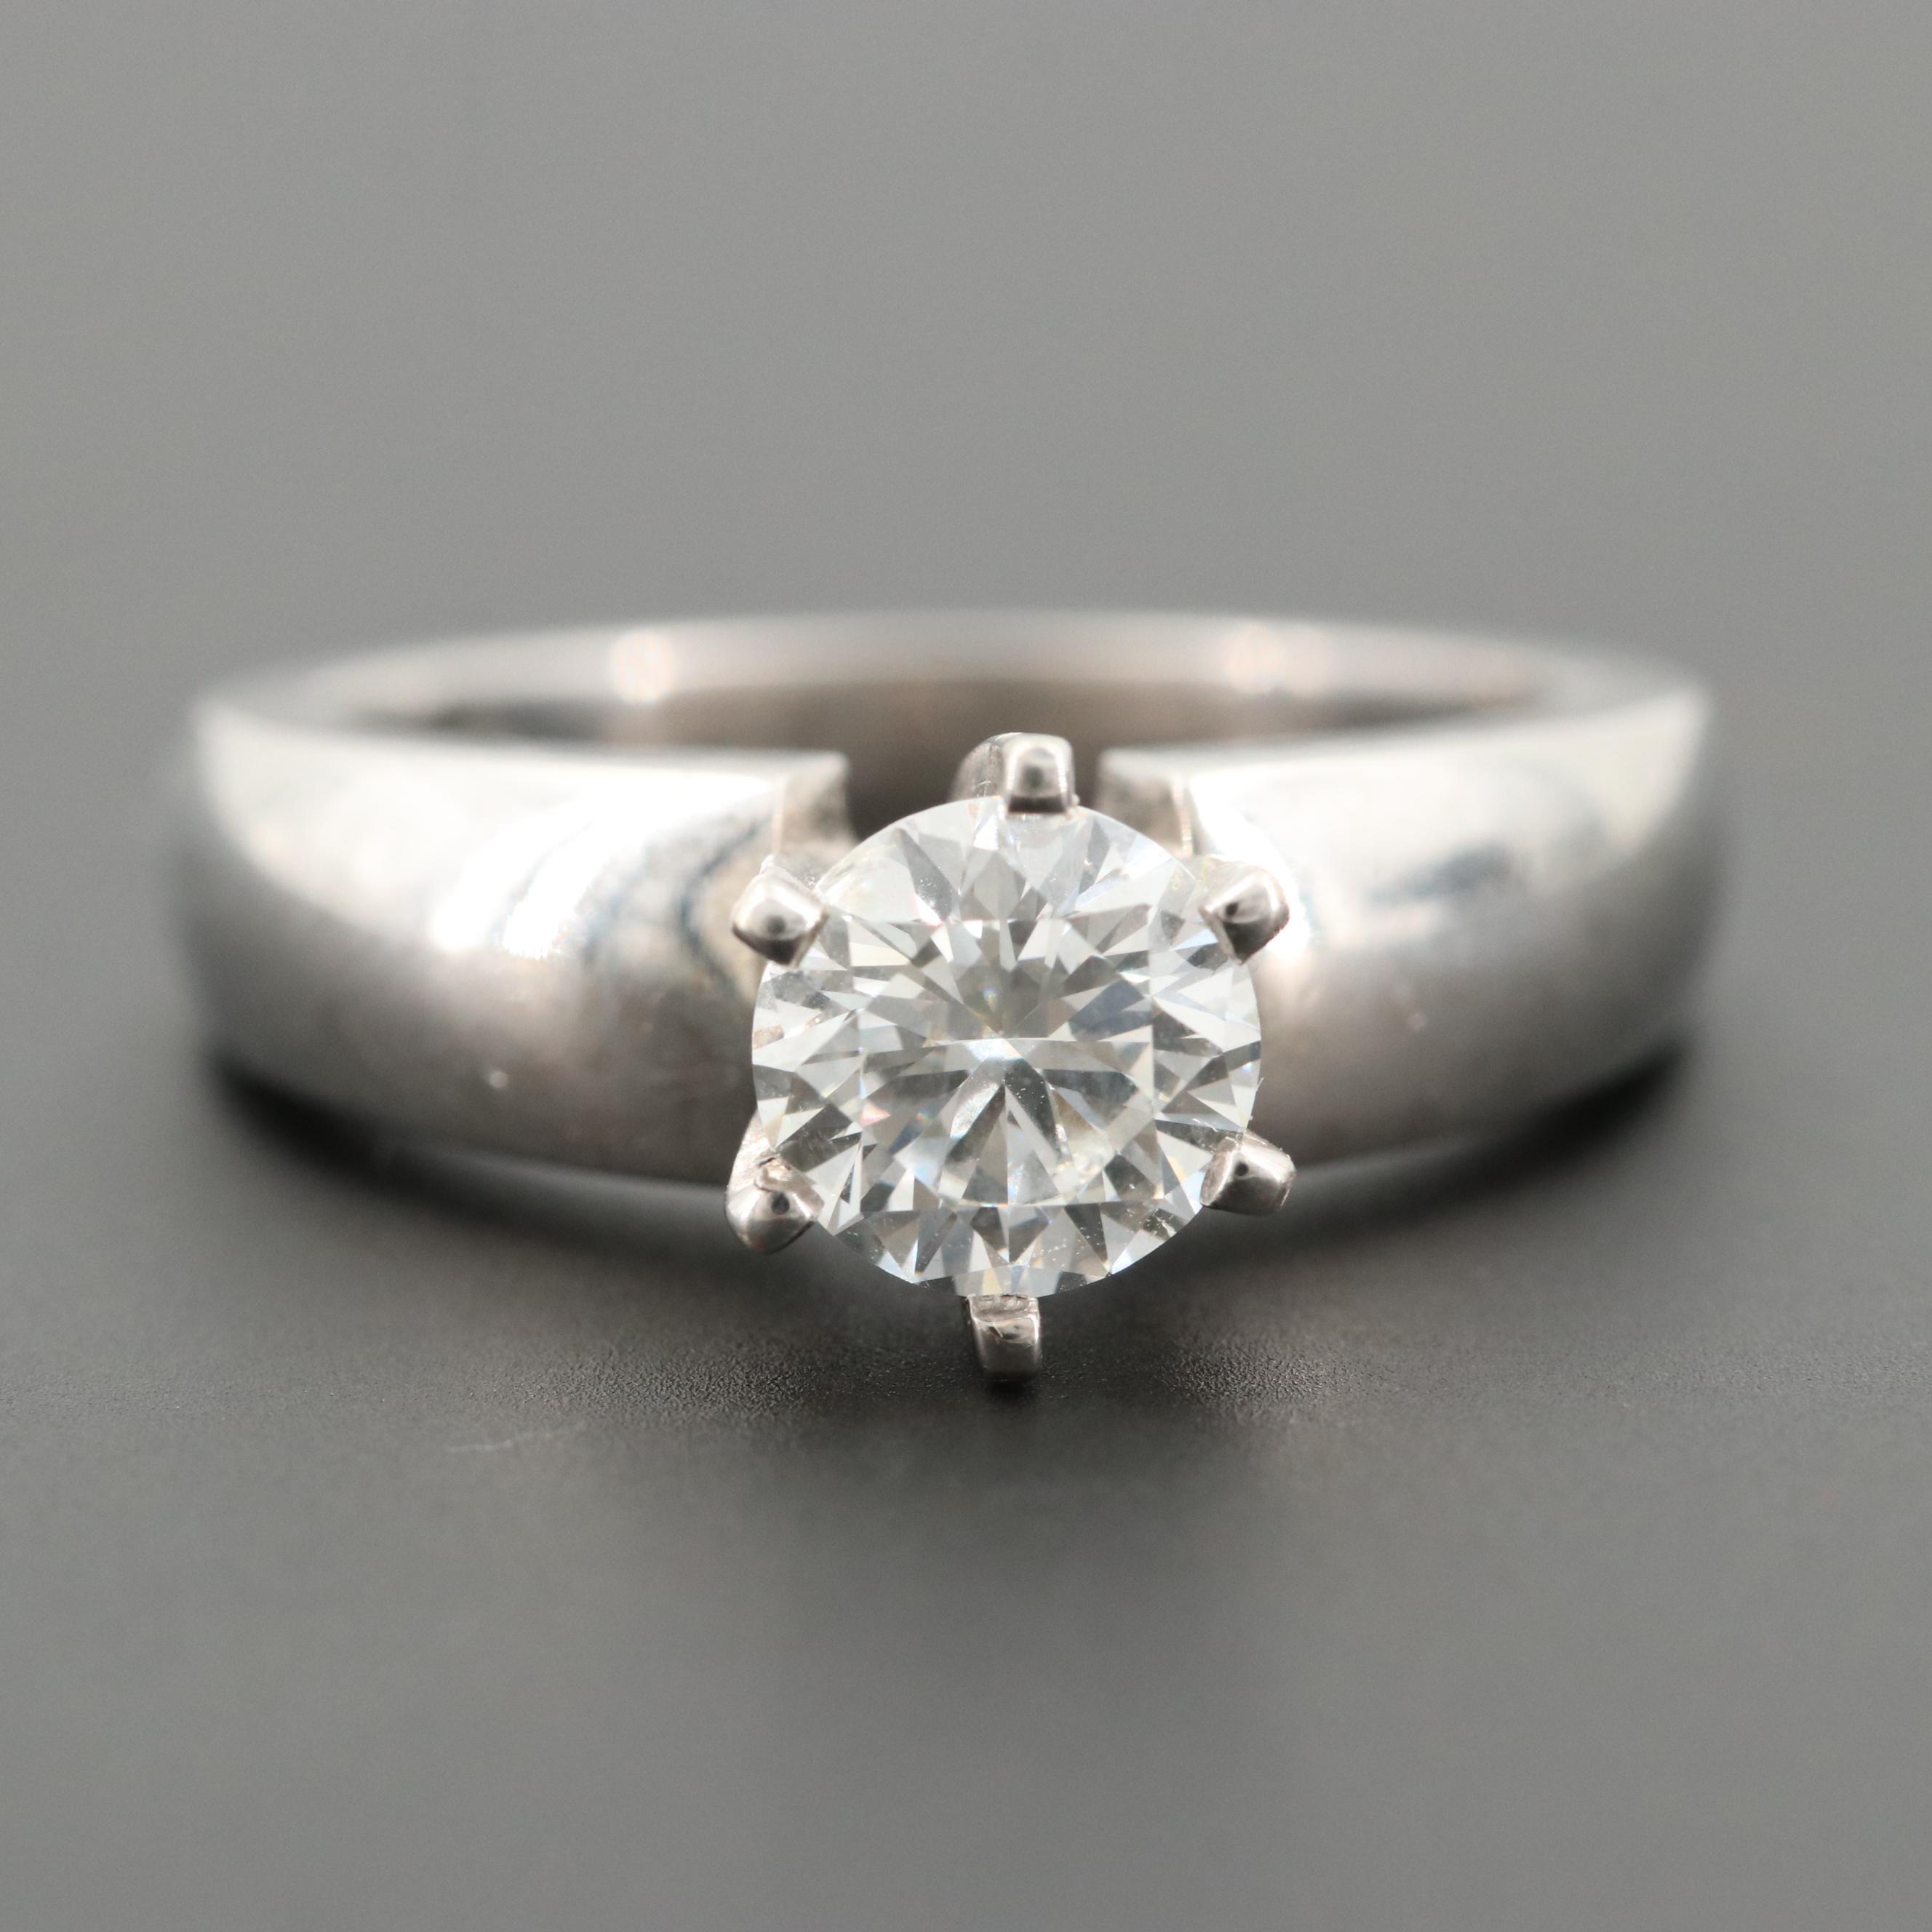 Platinum 0.99 CT Diamond Ring with 14K White Gold Head